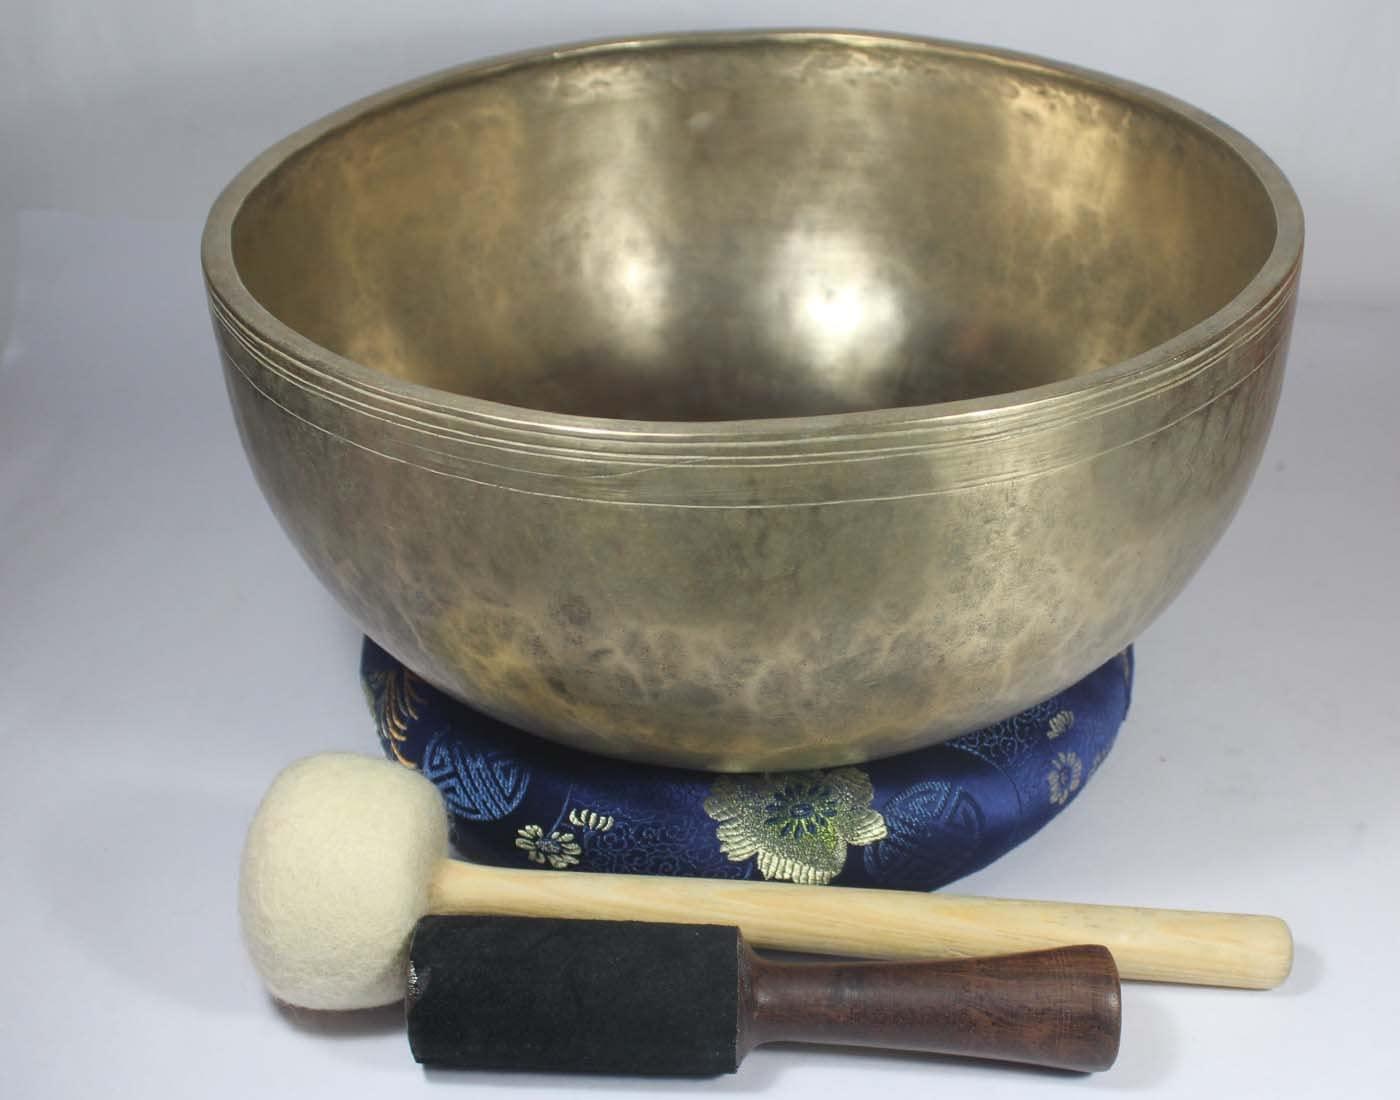 12 Inch Antique Singing Bowl